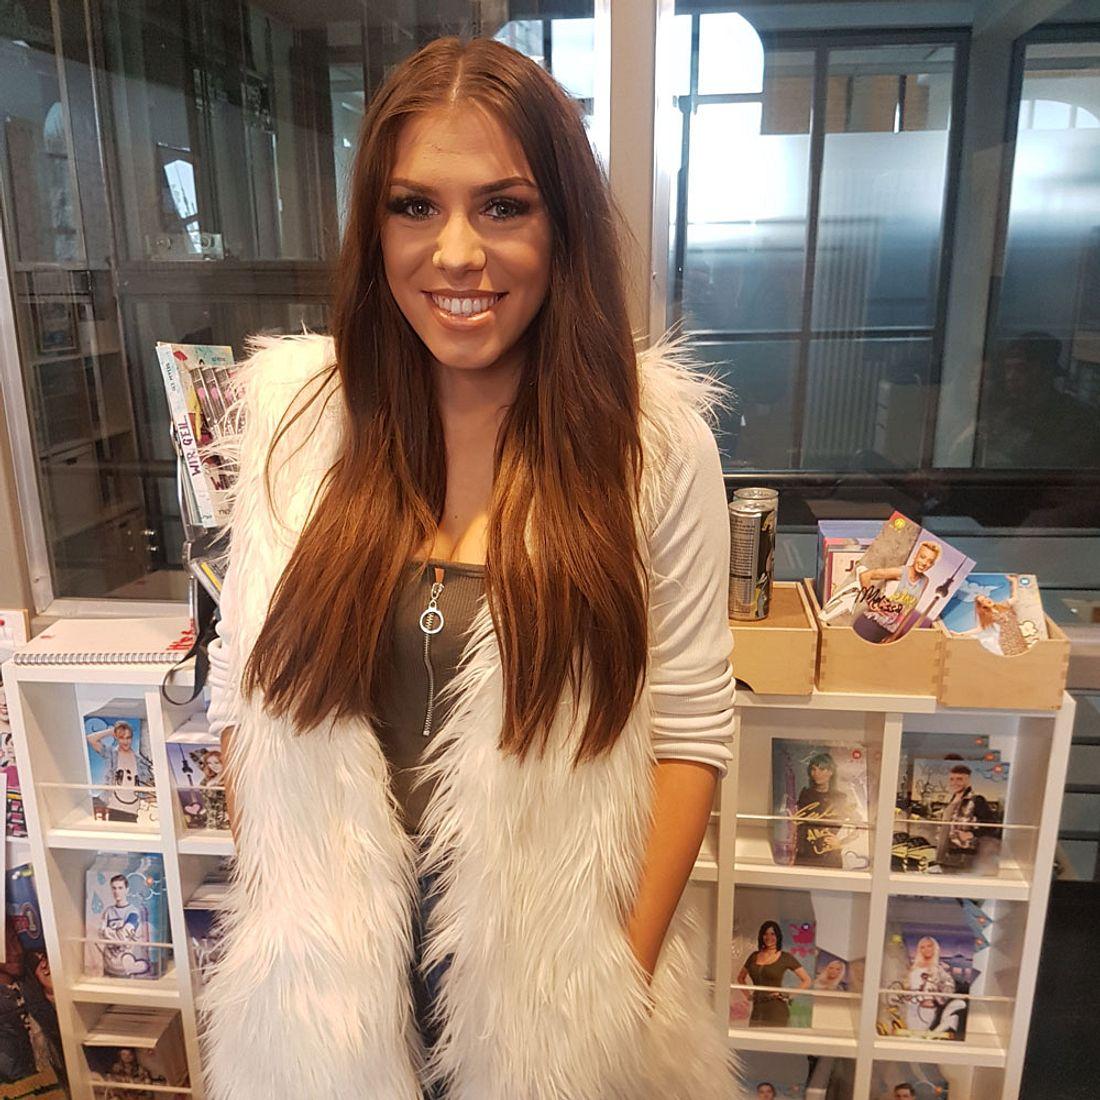 Nathalie Bleicher-Woth: So war das Coming-Out des BTN-Stars!